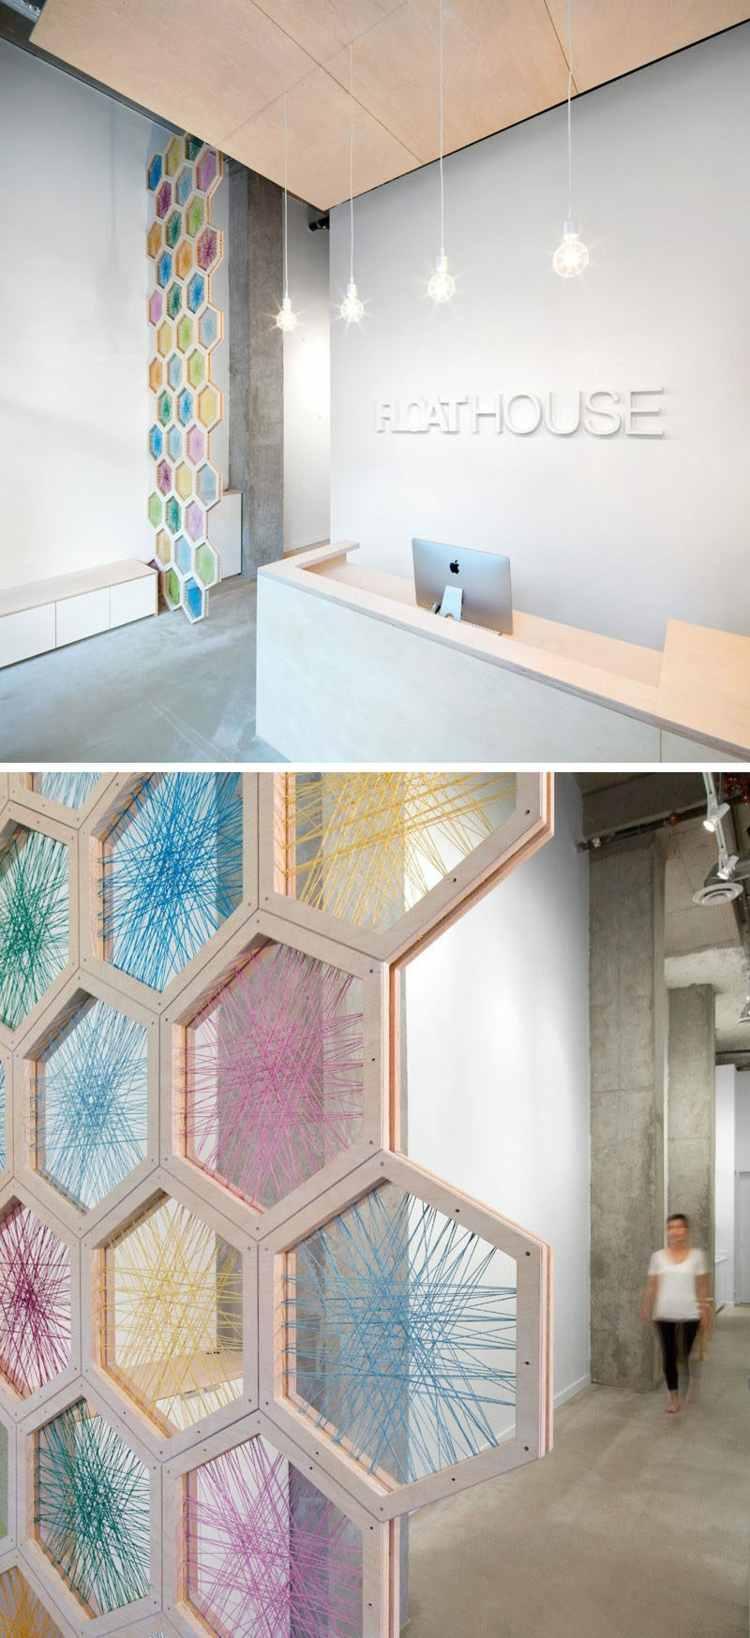 Deko Ideen mit Hexagon Motiven frs Interieur  20